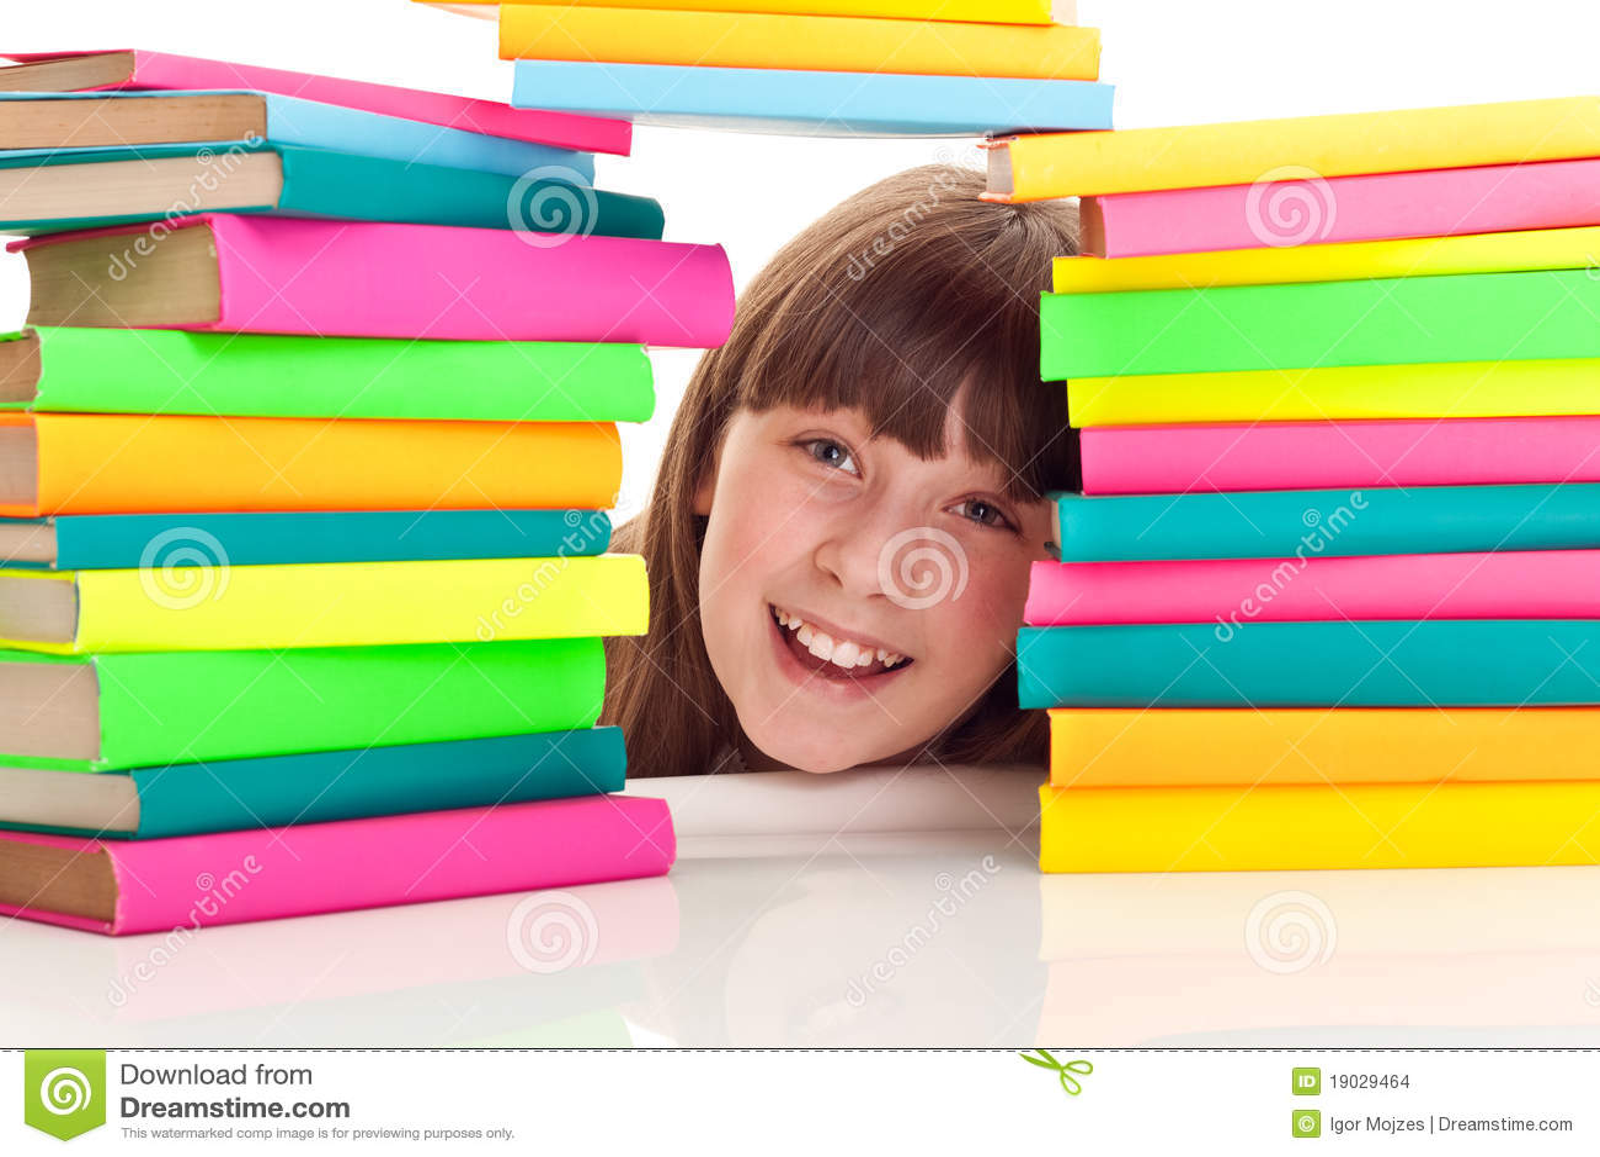 Bak böcker pile deltagaren